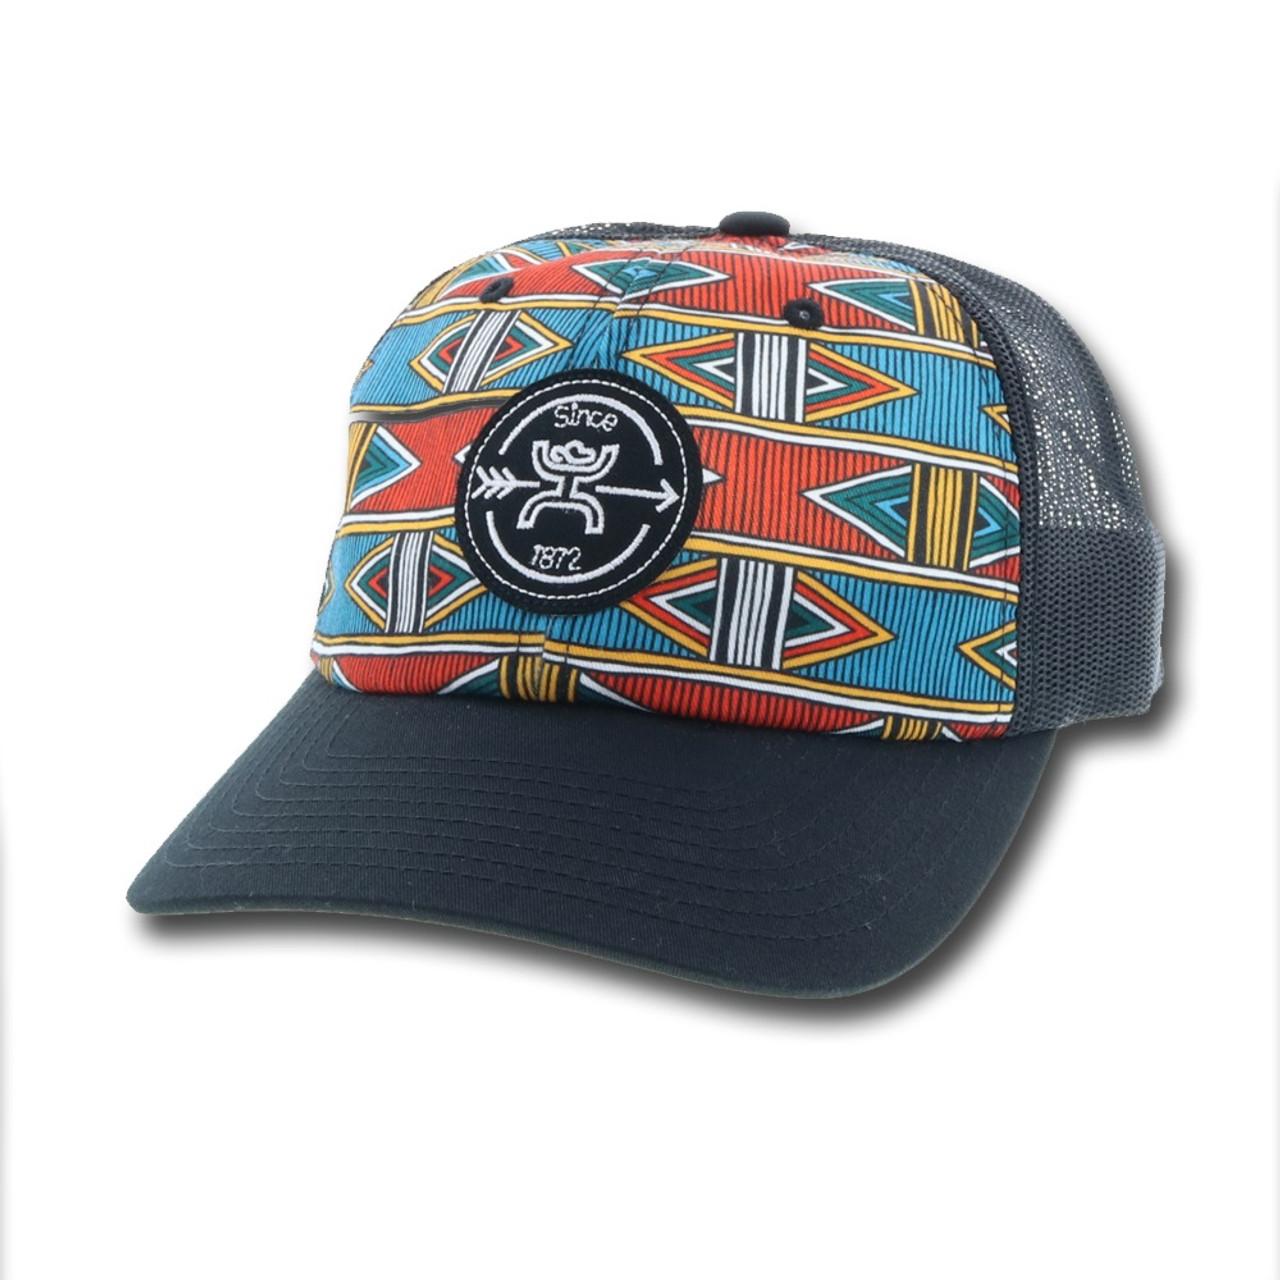 Hooey Quake Aztec Print Ball Cap 1842T-BL - Jackson s Western 1bd87517bad9